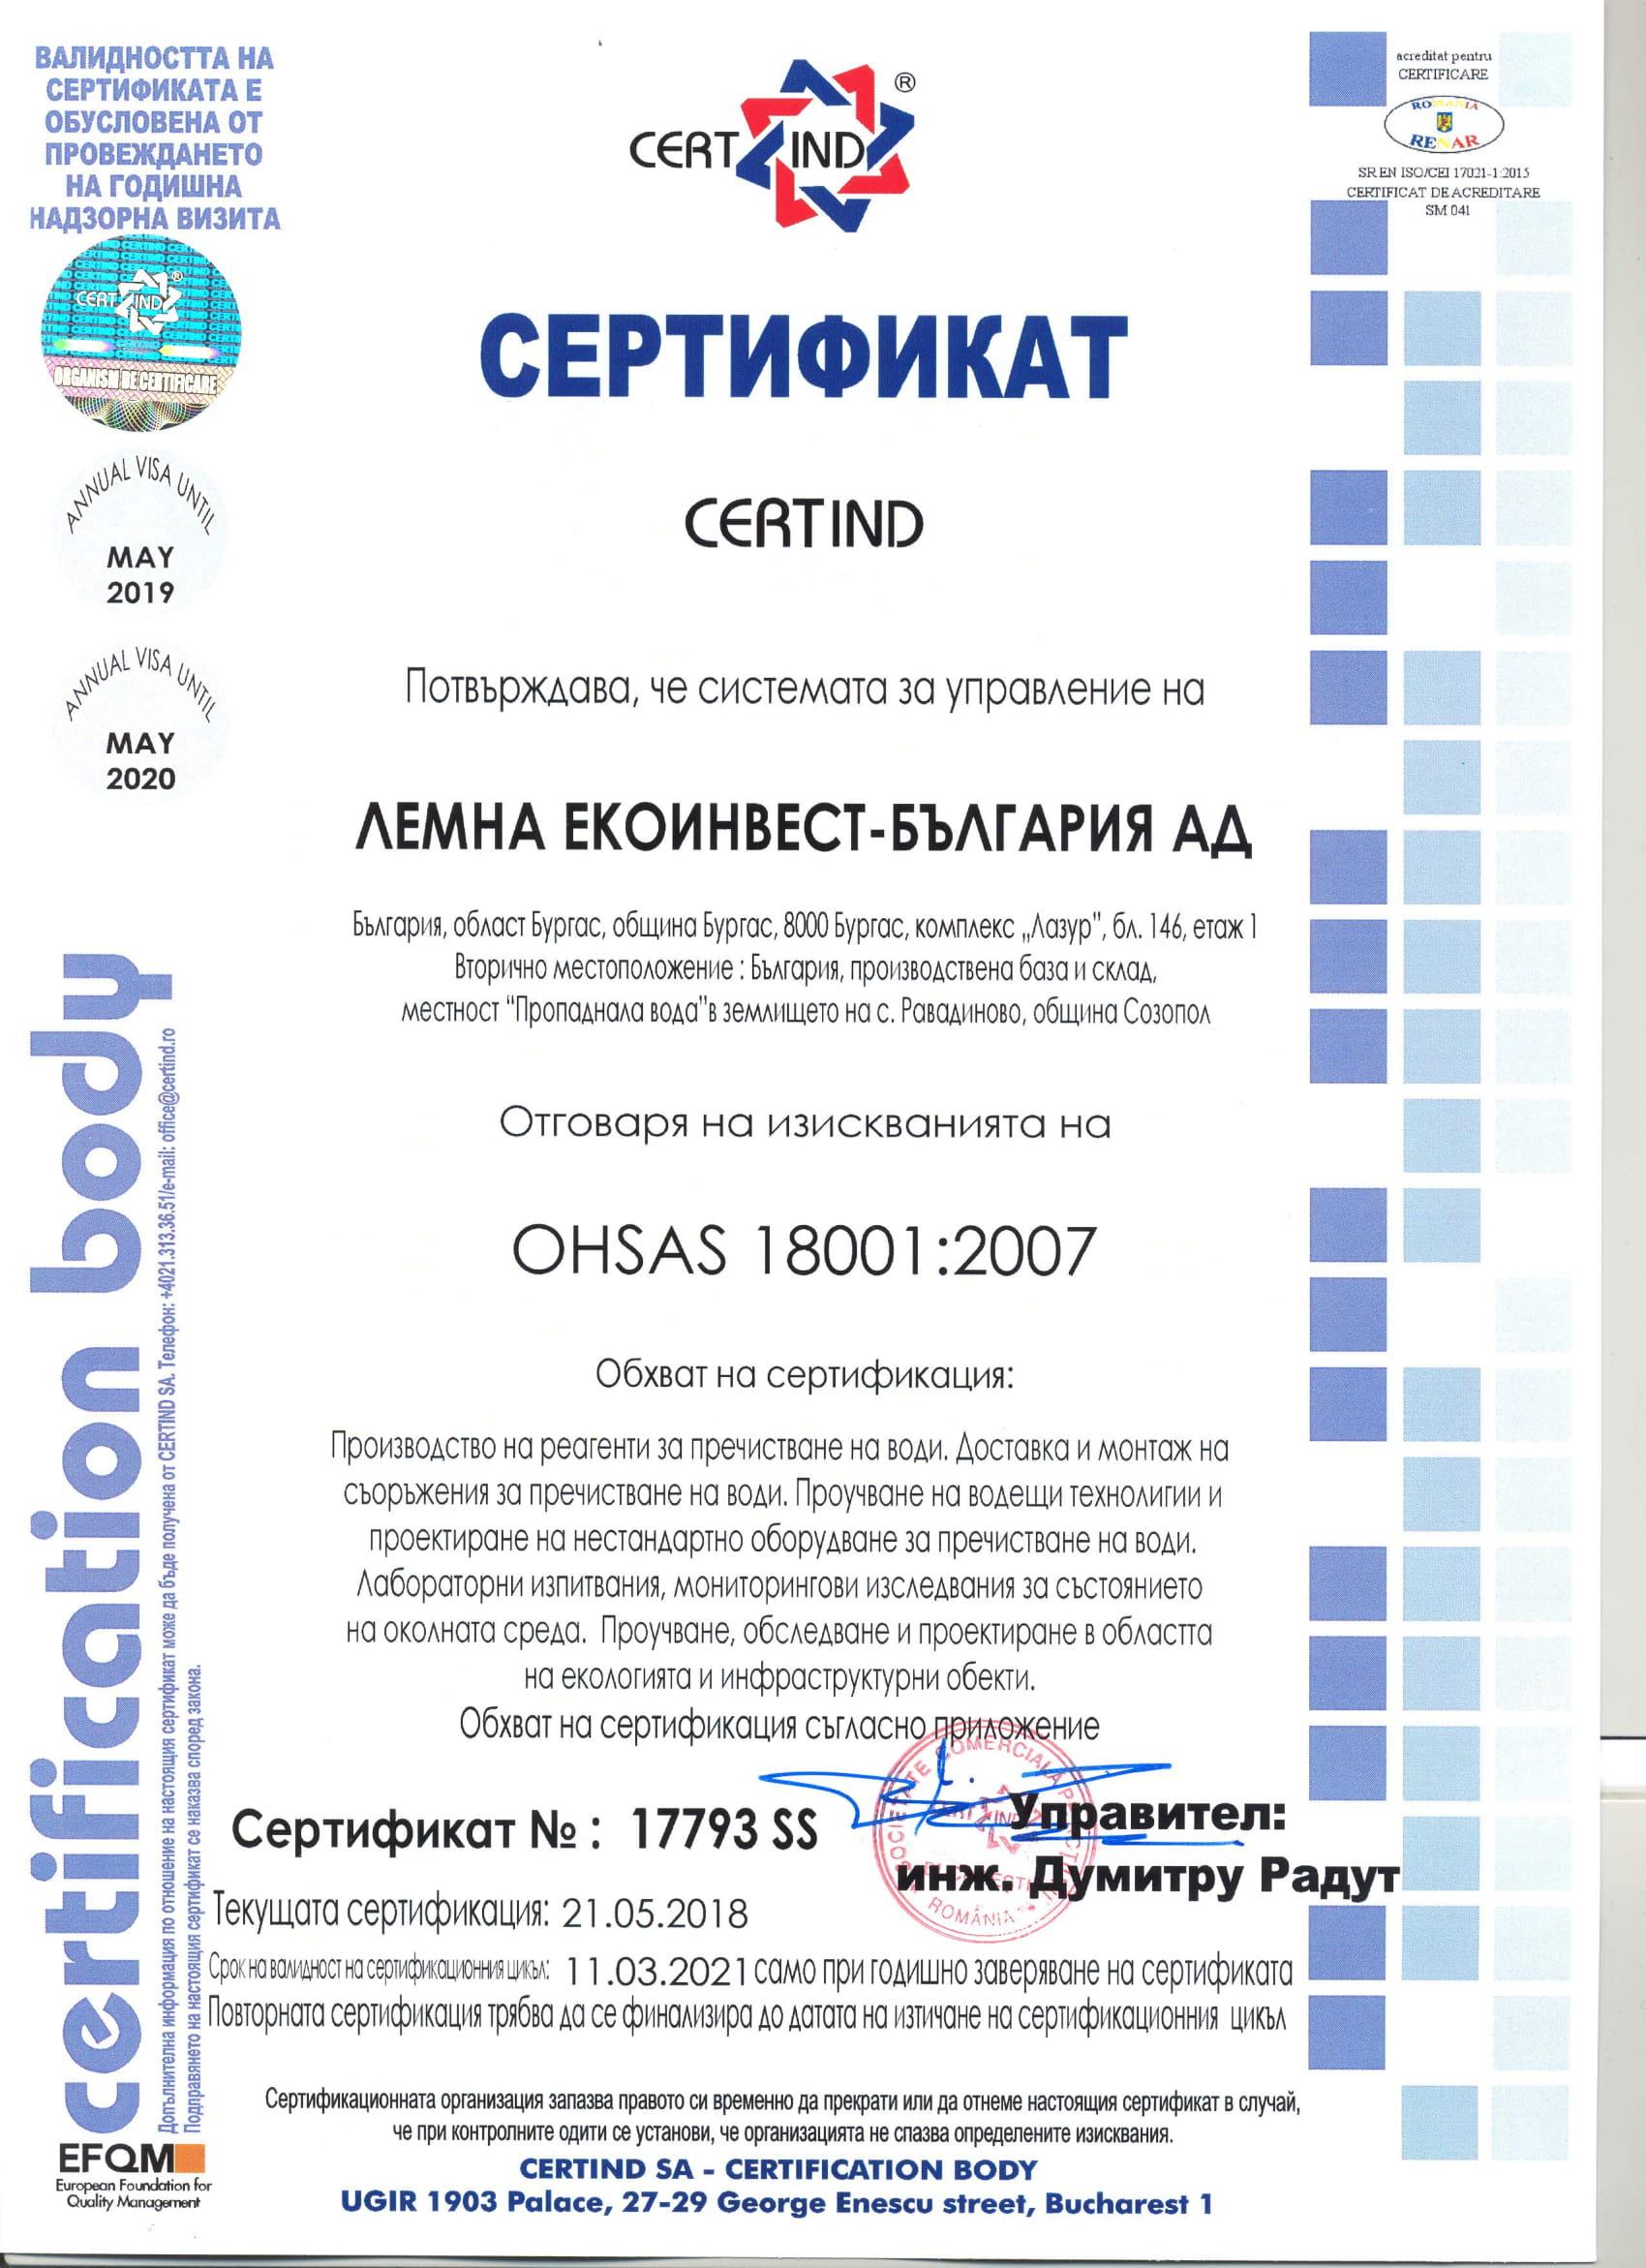 OHSAS 18001 2007 BG-1